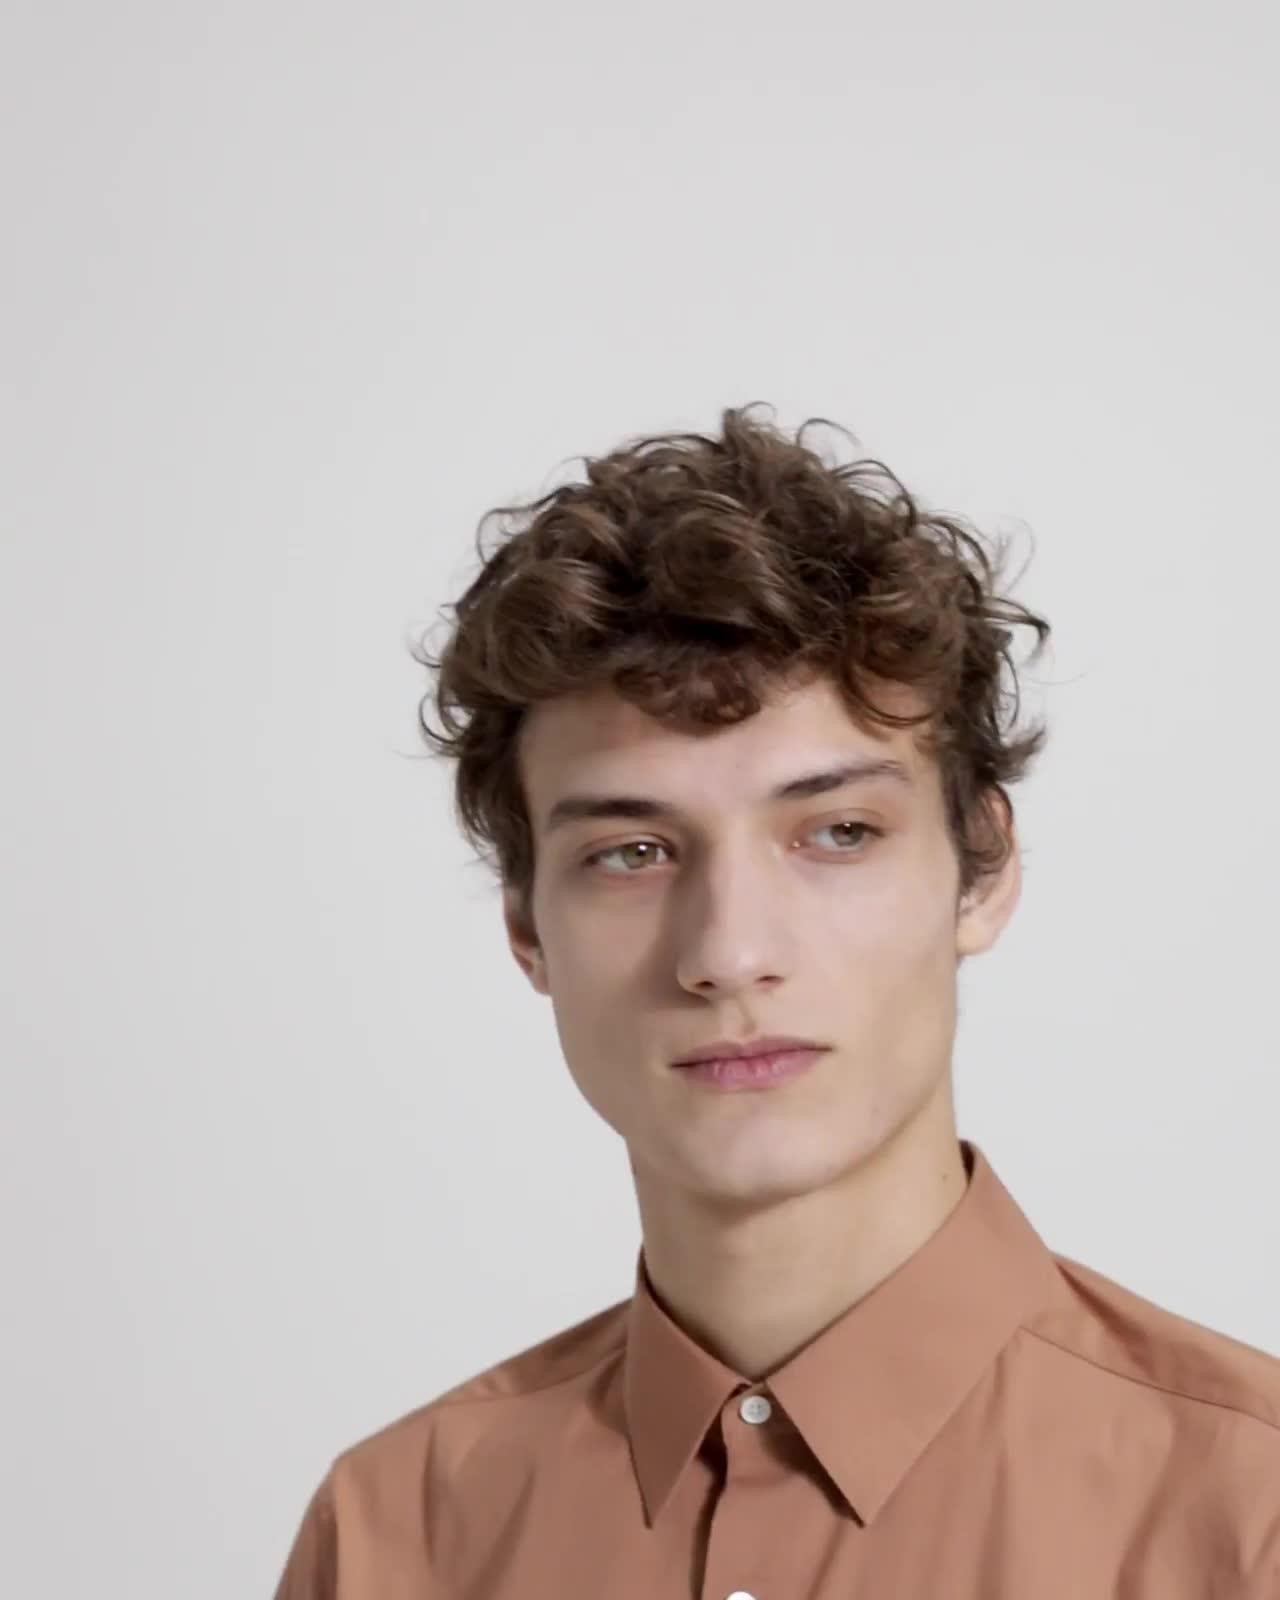 Sylvain Short-Sleeve Shirt in Good Cotton